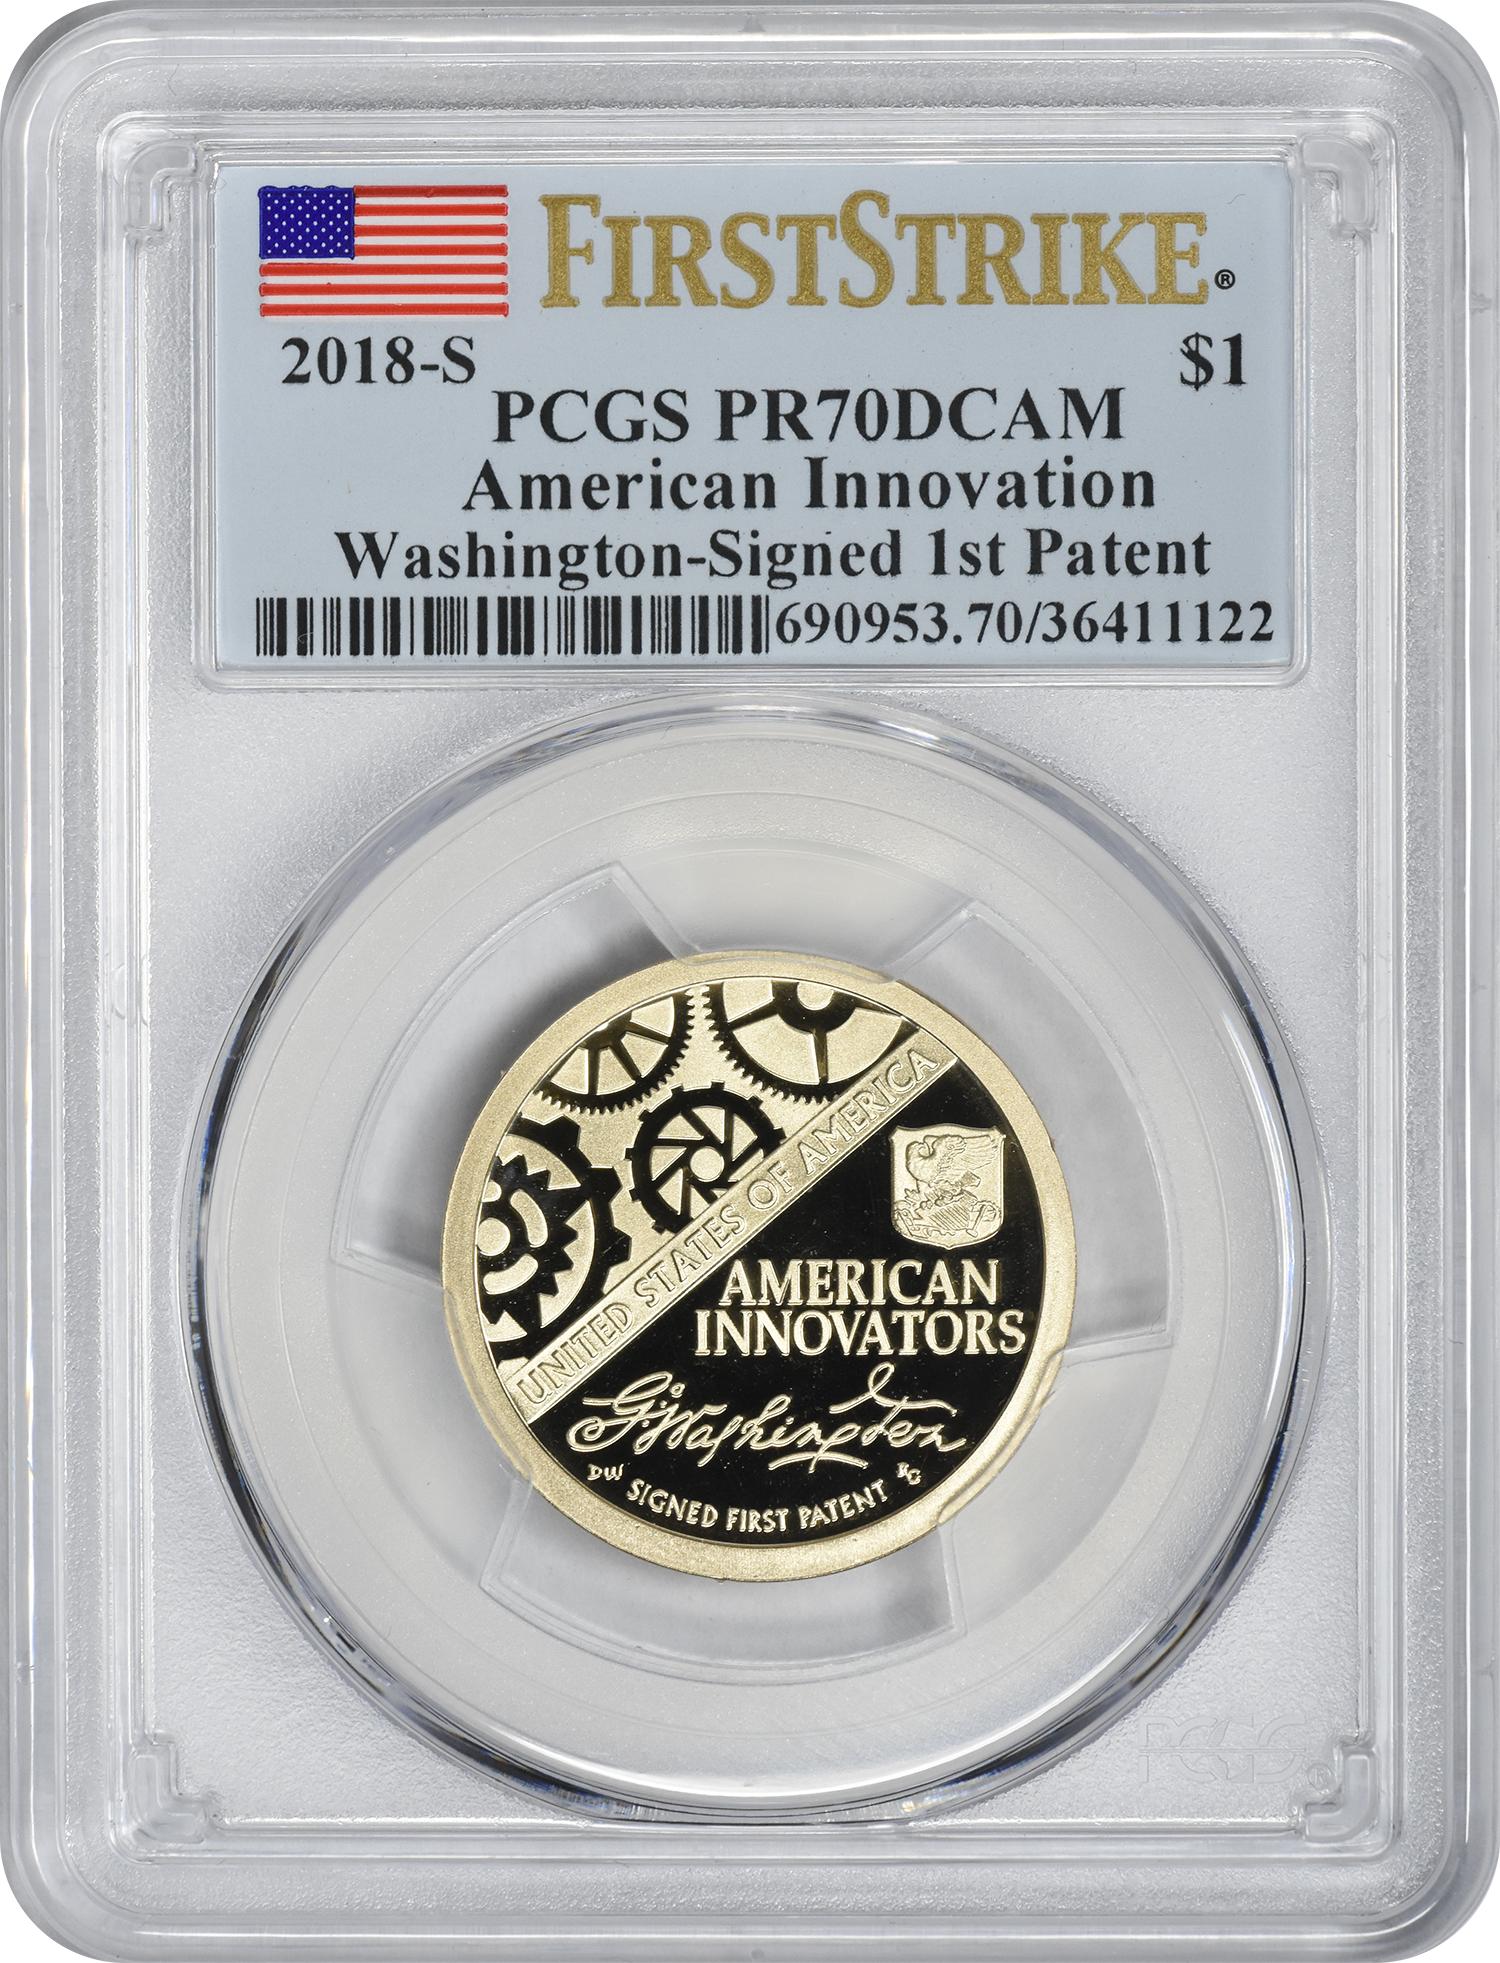 2018-S American Innovation Dollar Washington Signed 1st Patent PR70DCAM First Strike PCGS